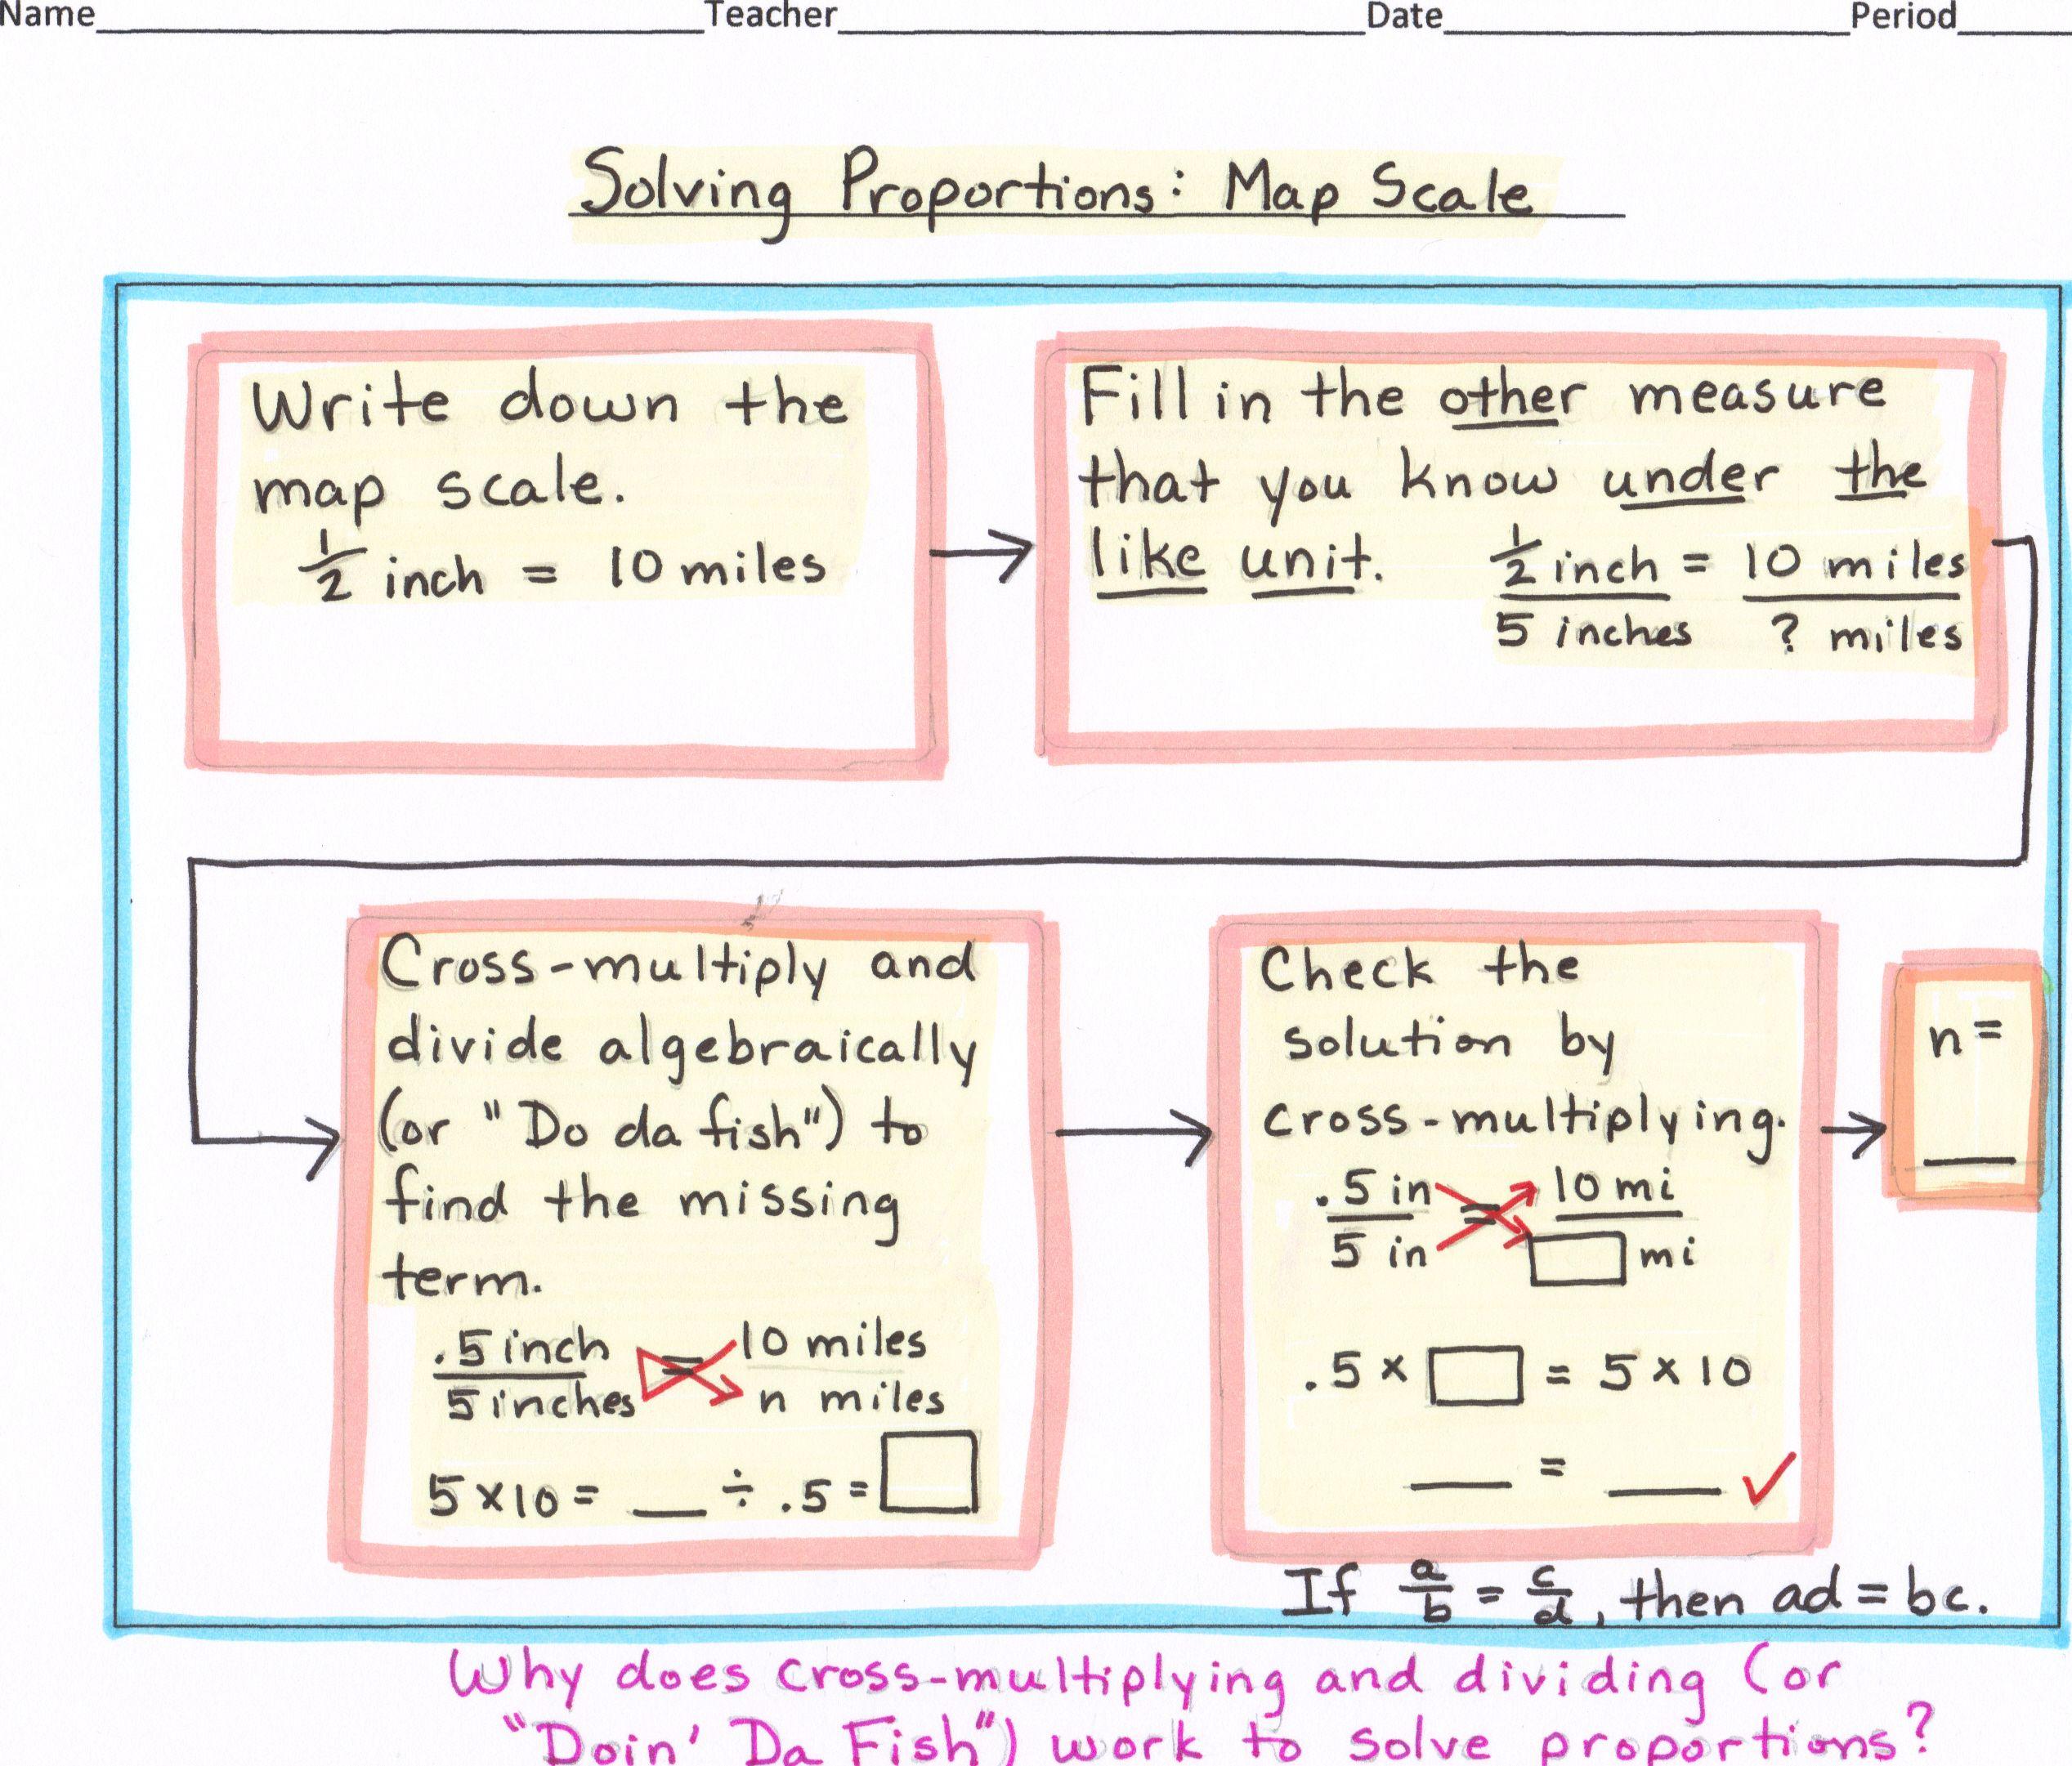 Gcf And Lcm Using Ladder Method Worksheet